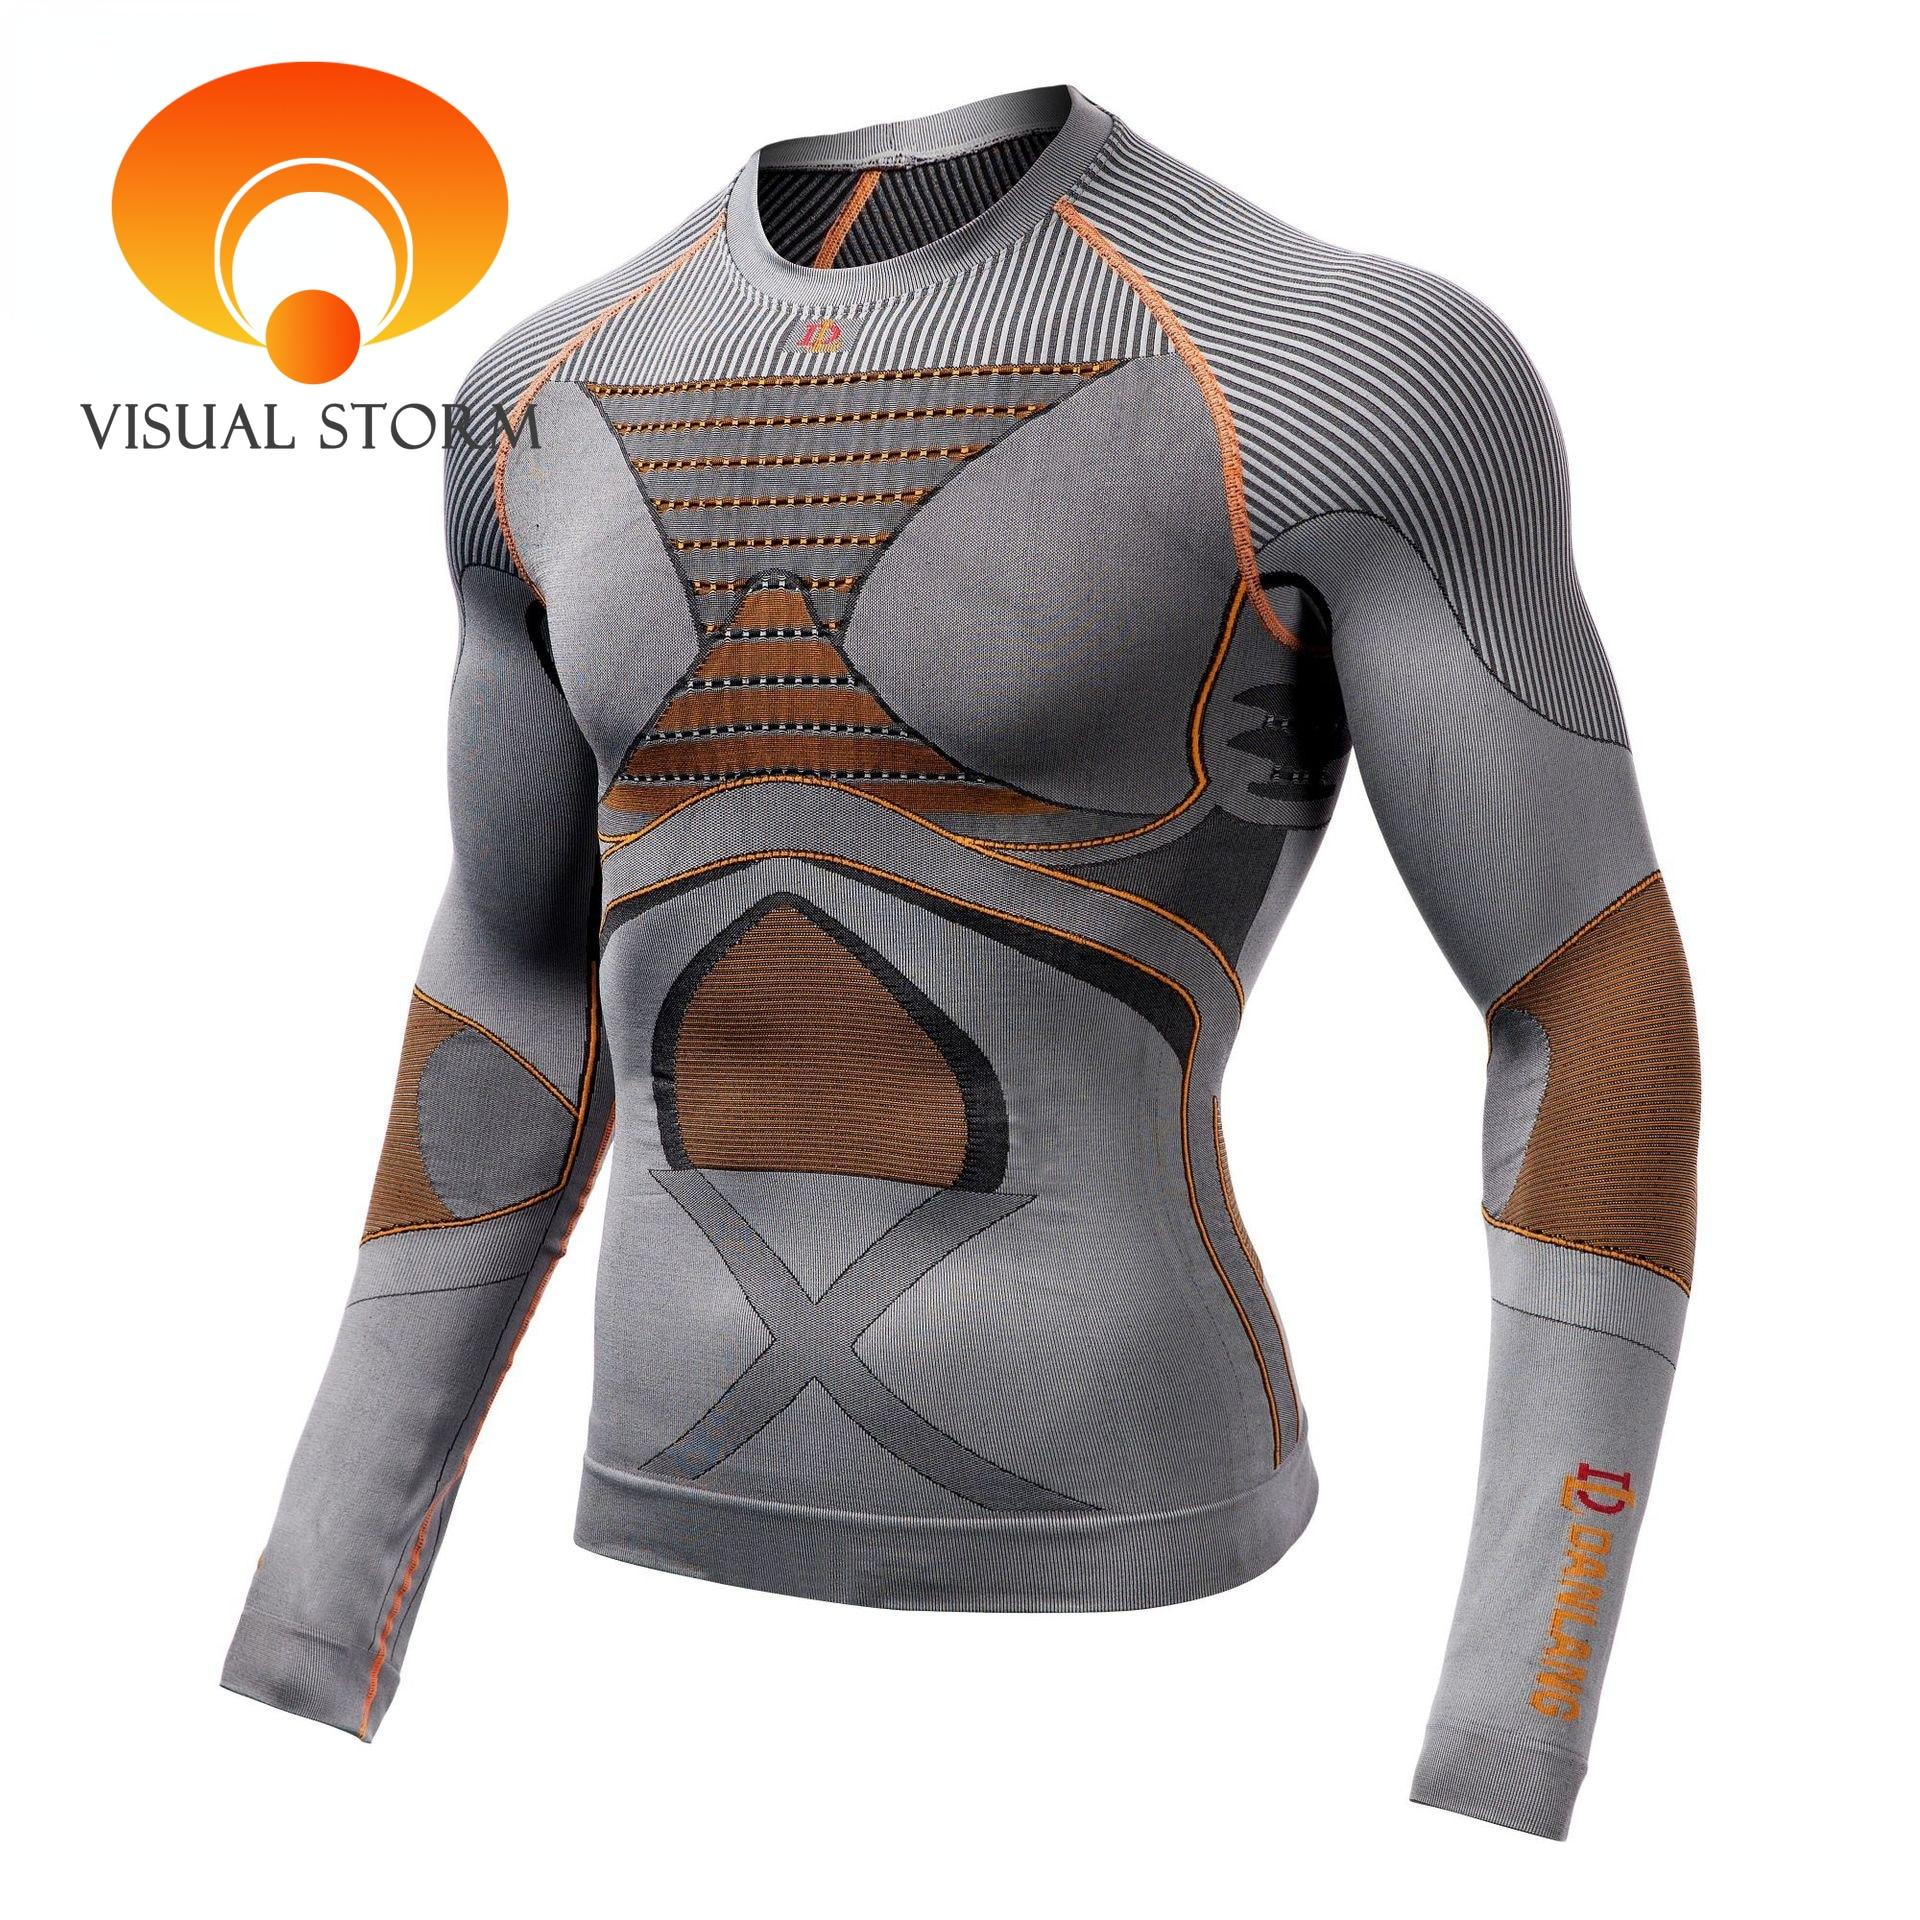 Professional Men Sport Shirt 3D Body Shaper Running Compression Shirts Corset Jersey Waist Trainer Slim Tops Gym Workout Sets